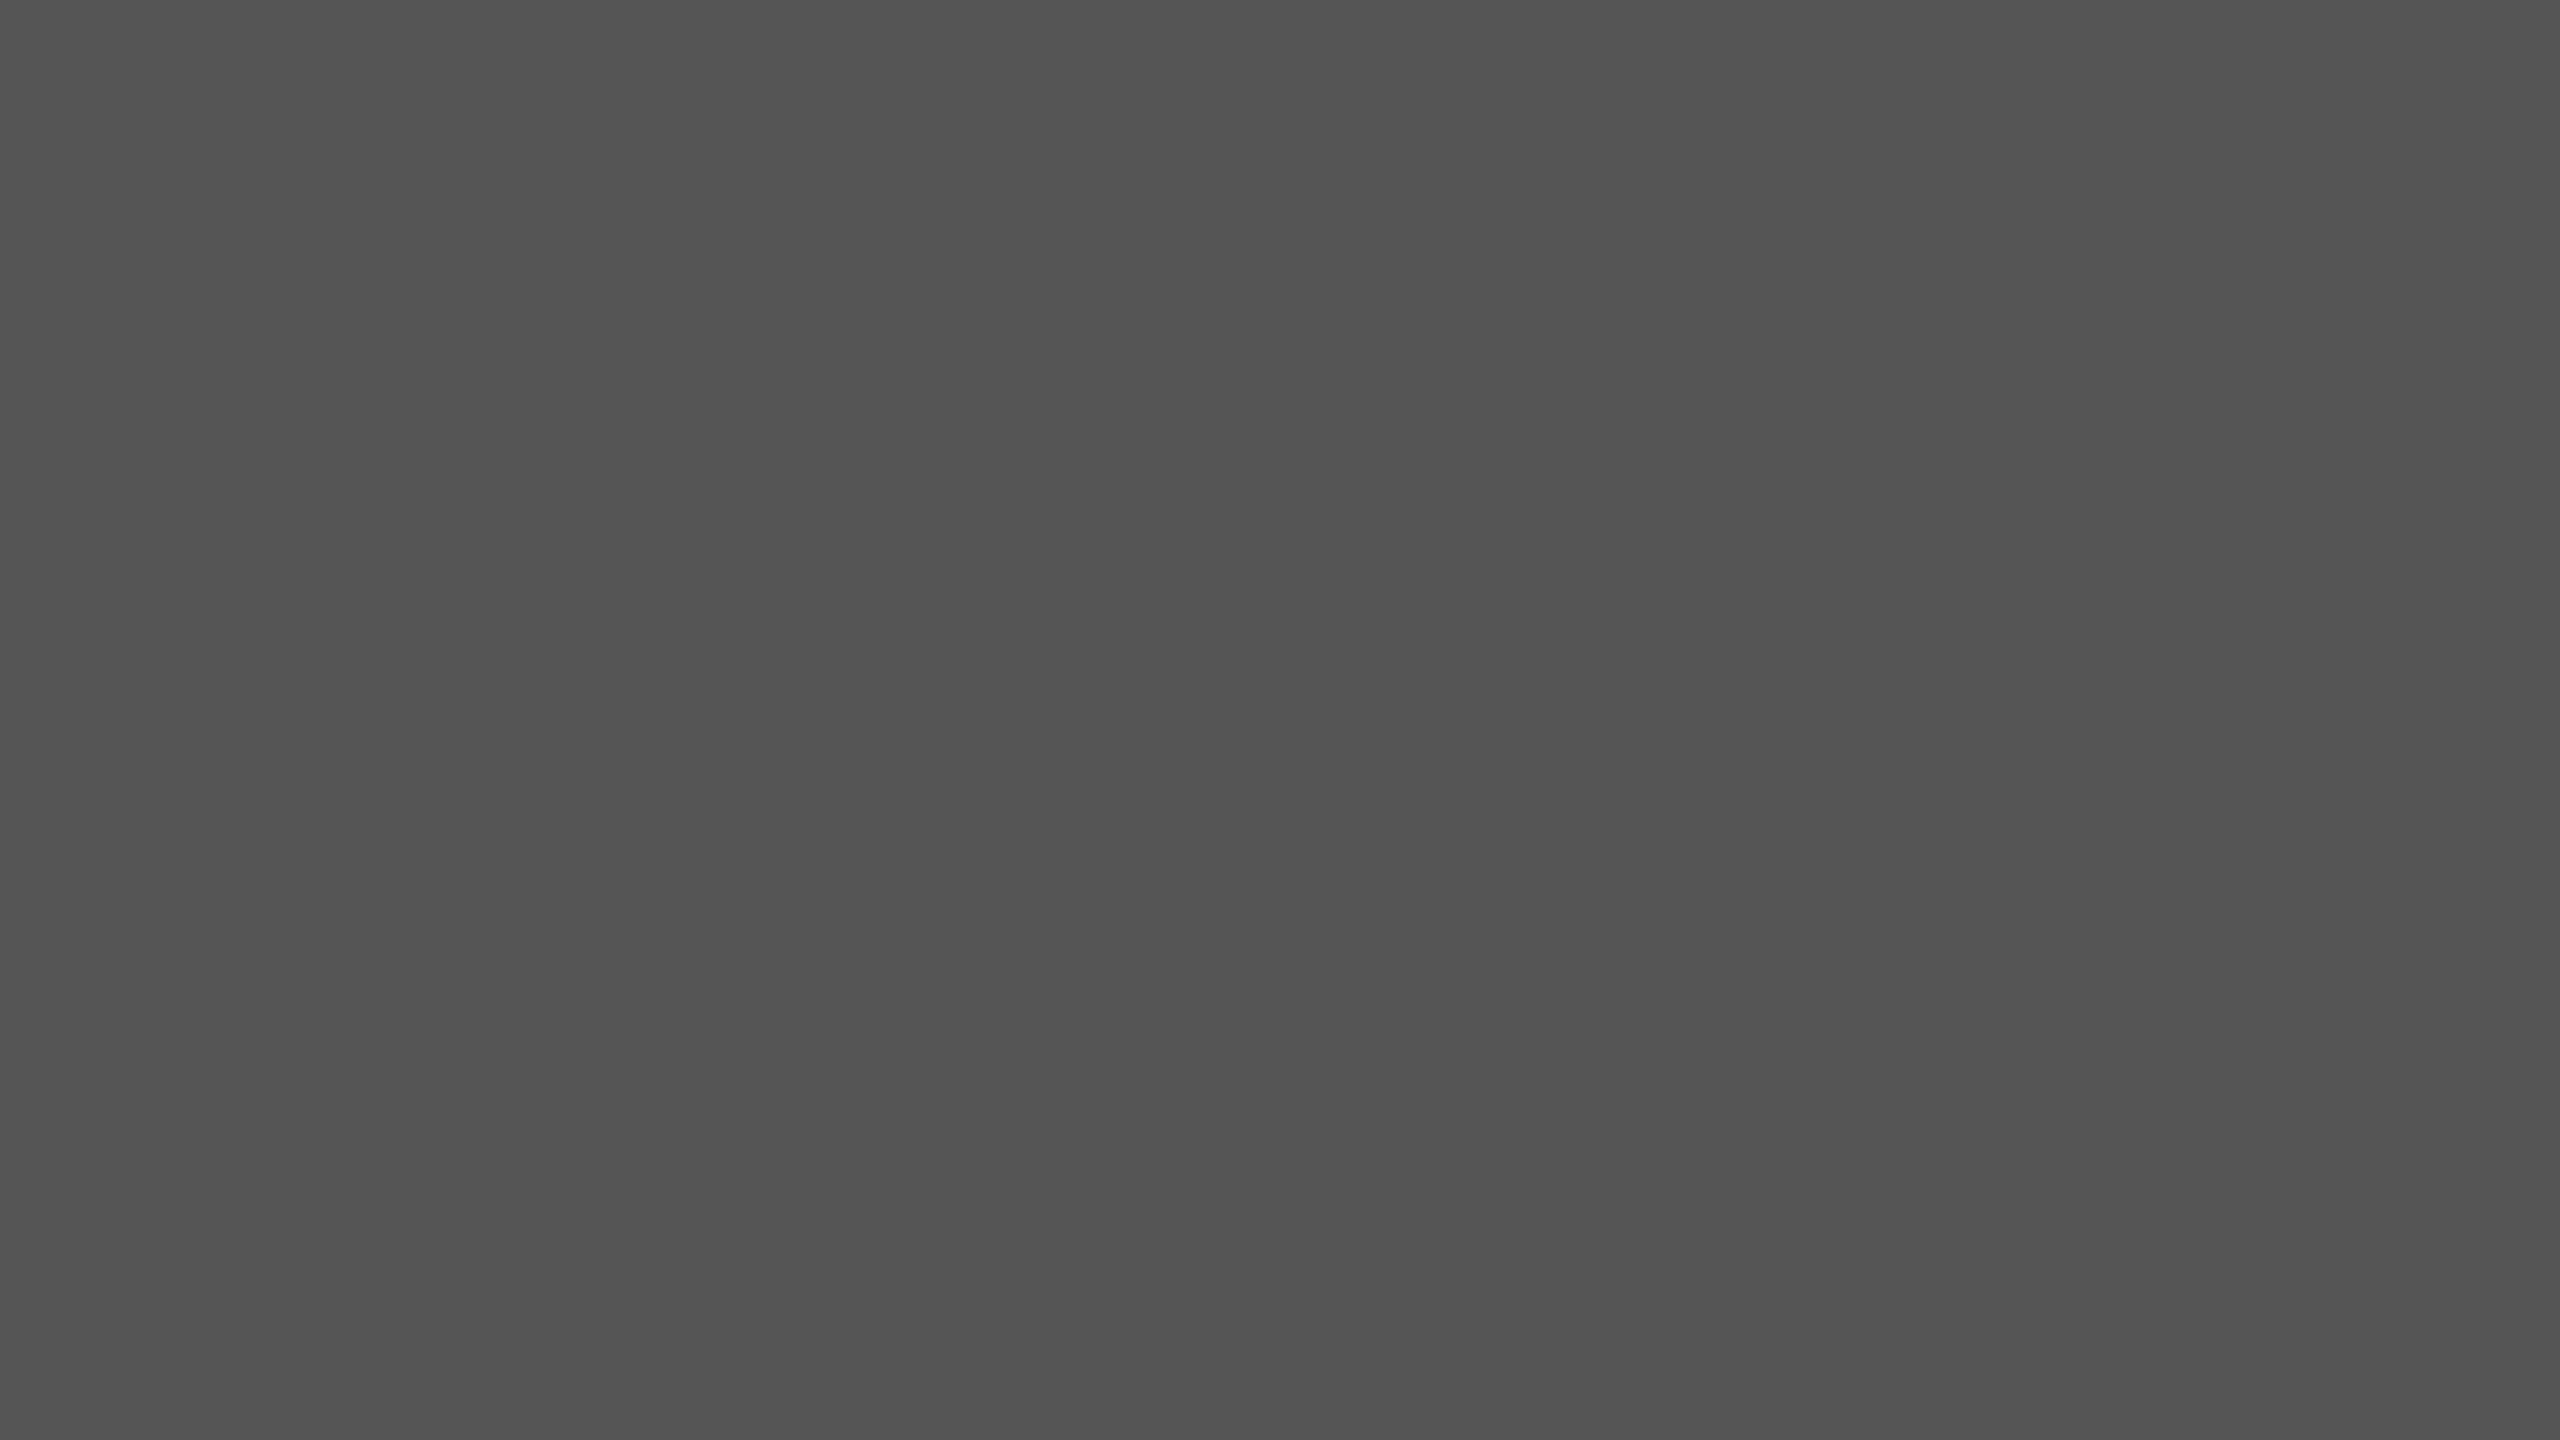 grey_image2